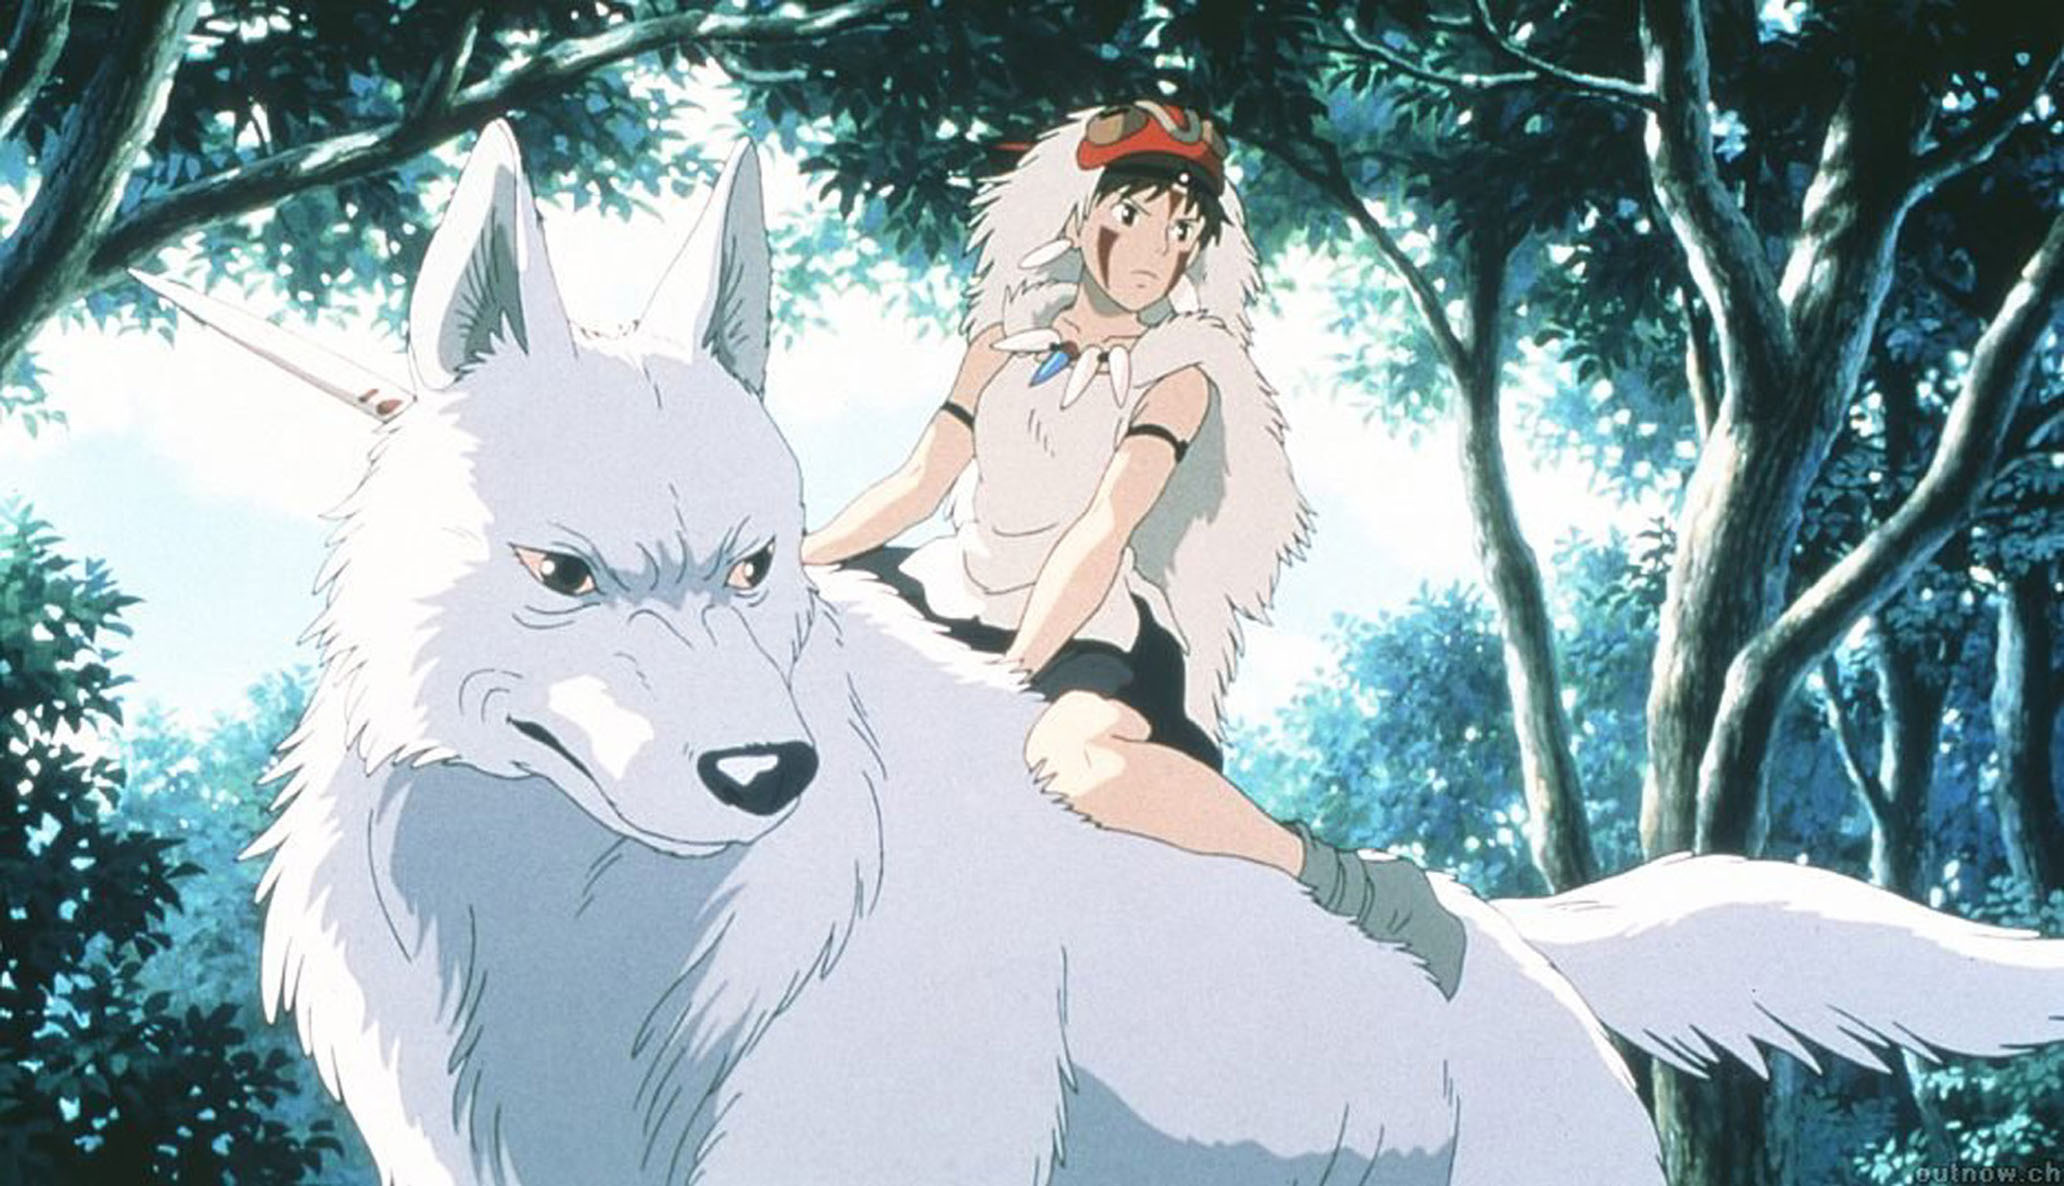 http://images2.fanpop.com/image/photos/14400000/Princess-Mononoke-hayao-miyazaki-14490135-2064-1186.jpg